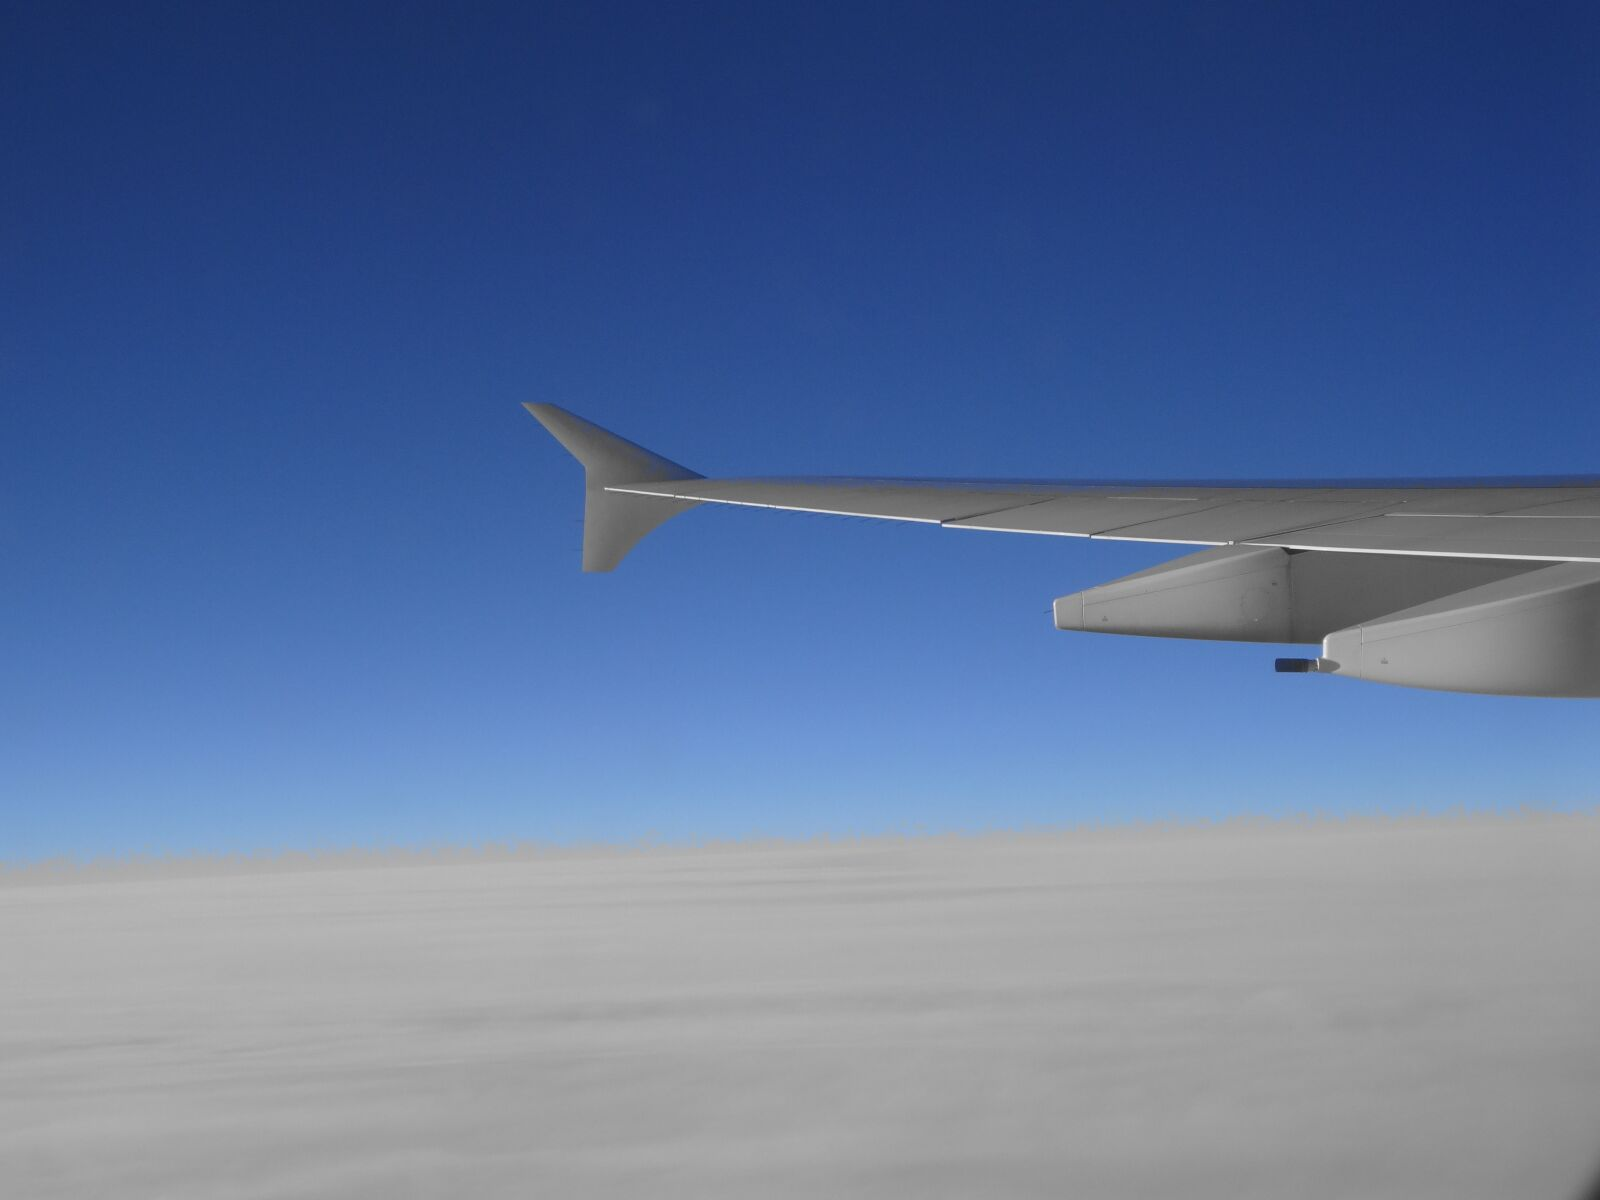 plane, sky, travel